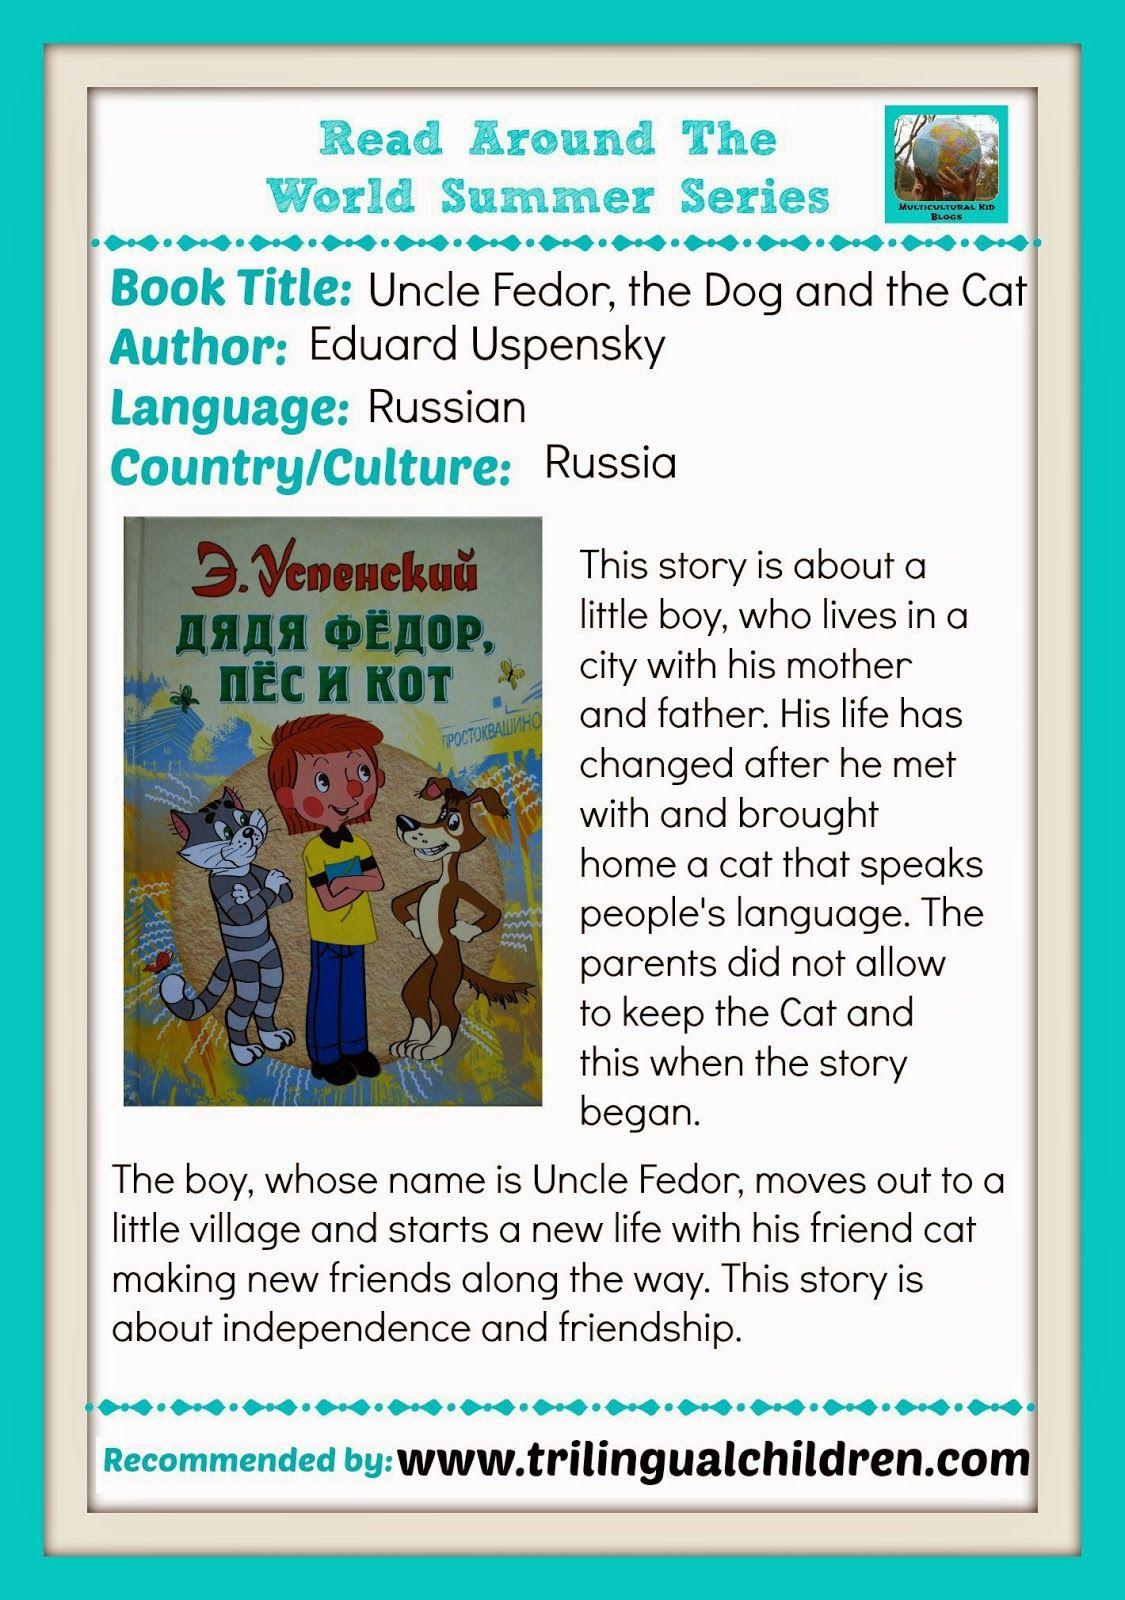 Raising A Trilingual Child Good Reads Books About Prostokvashino By Uspensky Read Or Watch